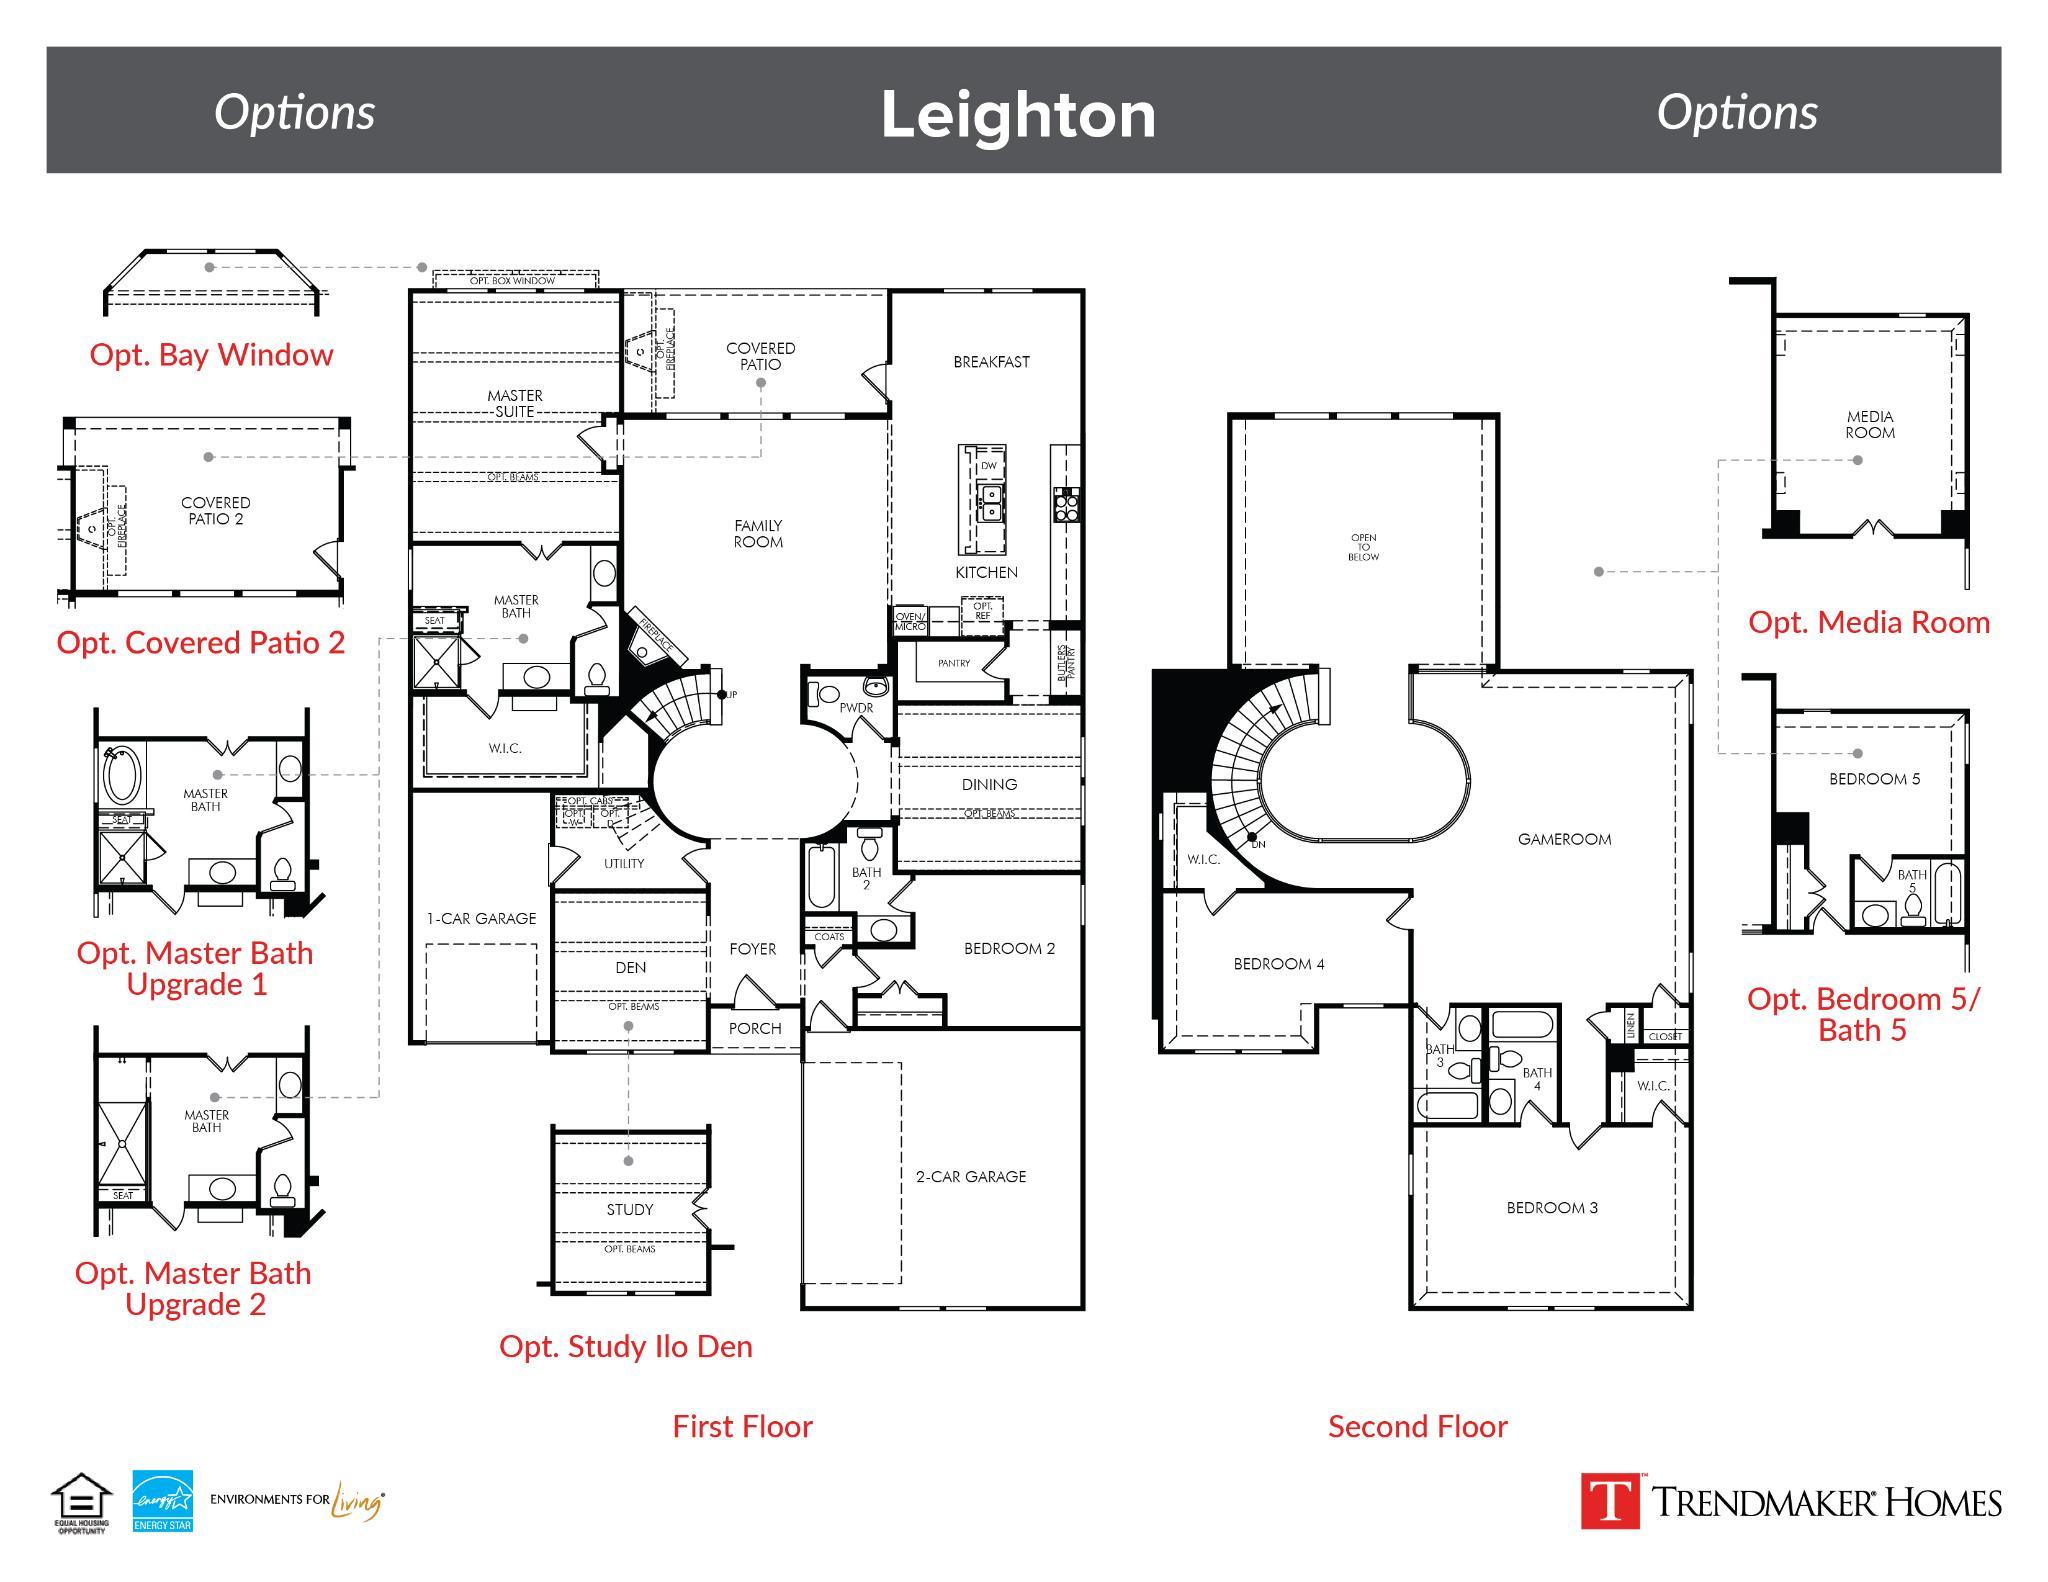 Leighton - Parks at Legacy